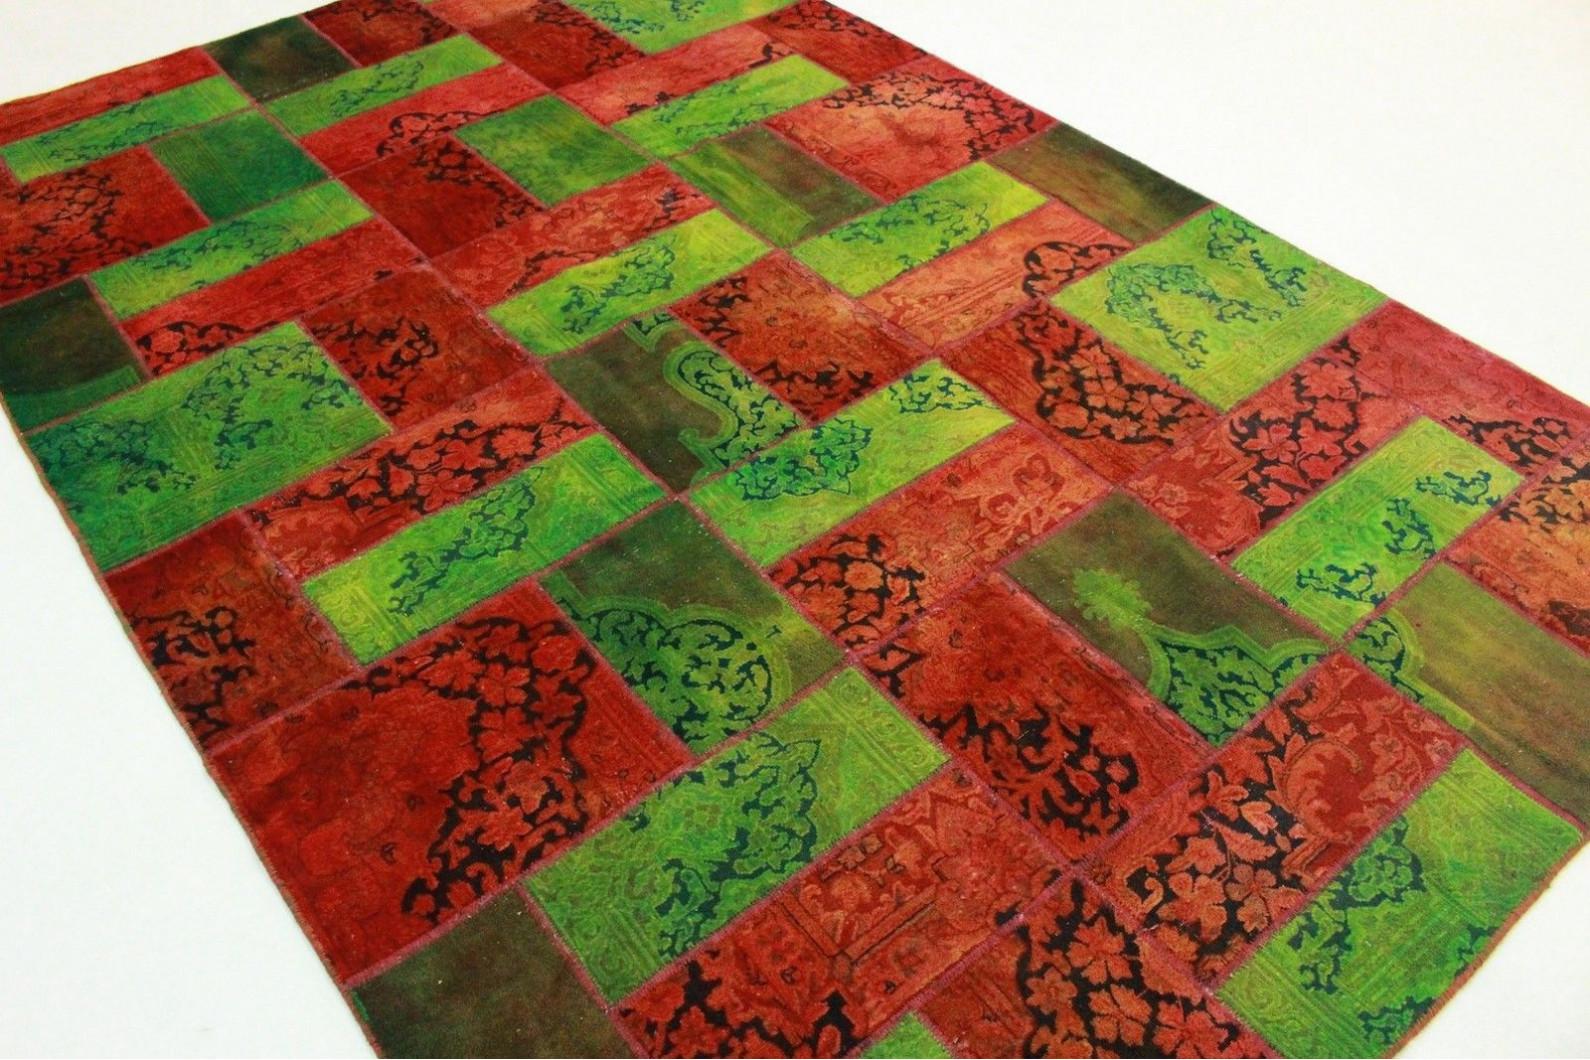 Patchwork Teppich Grun Rot In 310x220cm 1001 1939 Bei Carpetido De